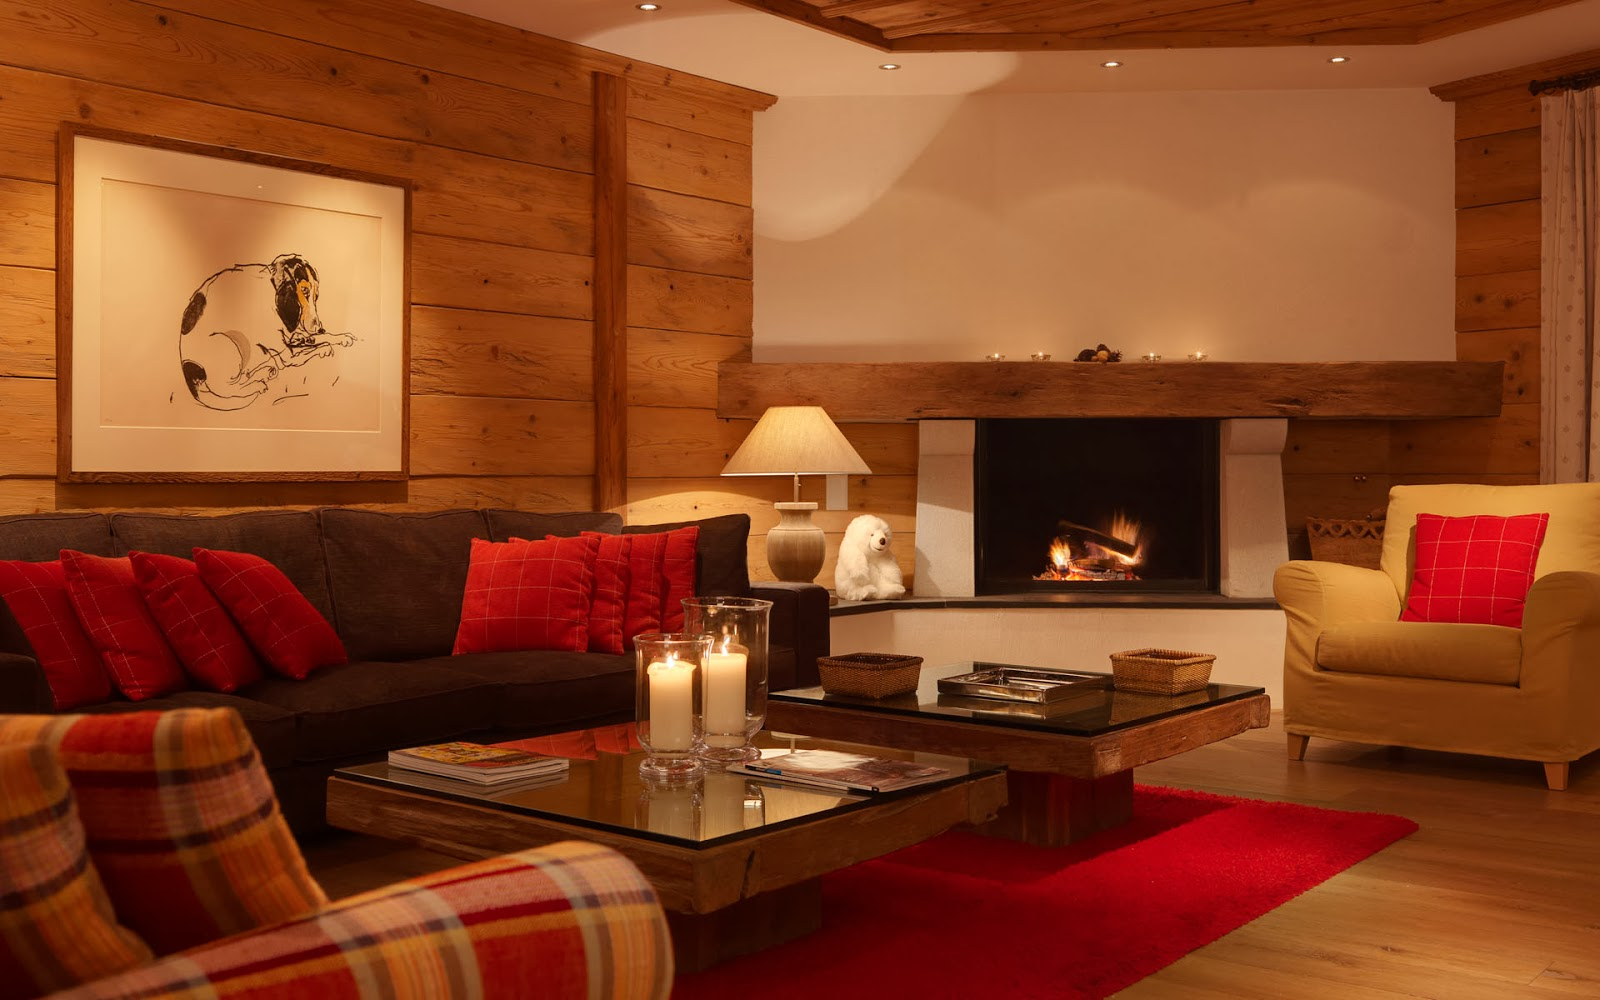 Luxury Life Design: Chesa Falcun Chalet, Switzerland - one